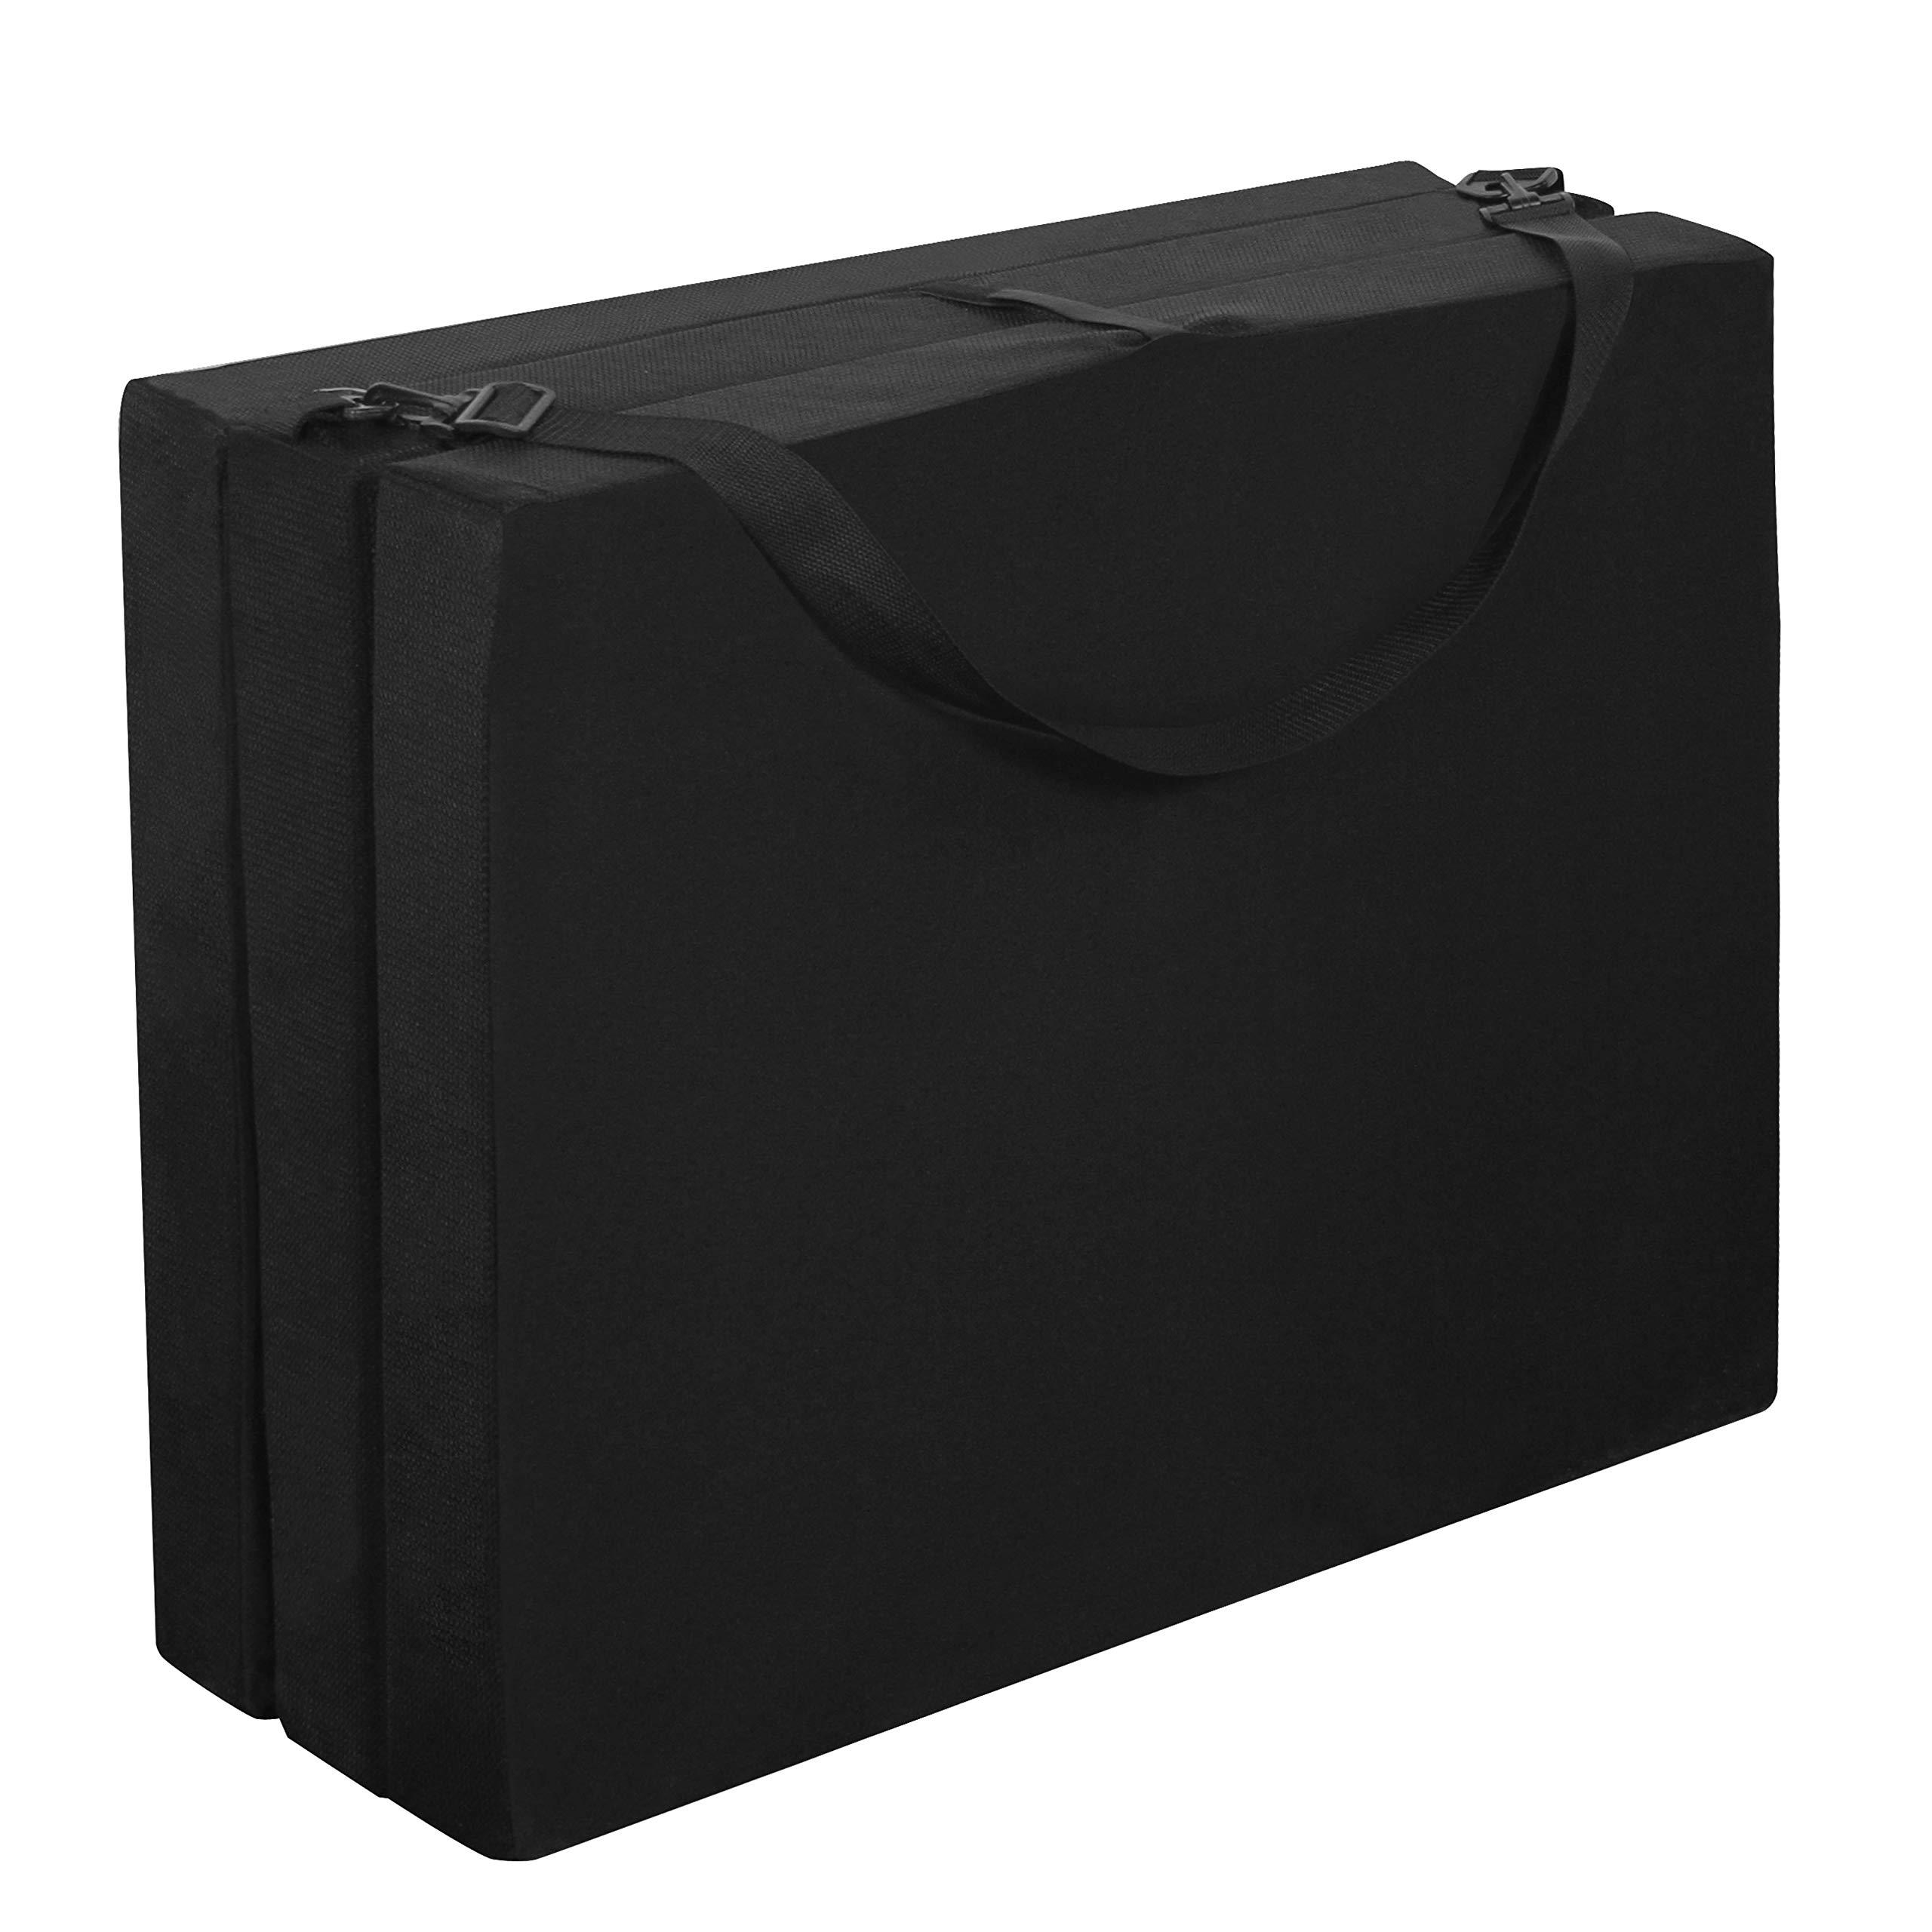 American Furniture Alliance Hide A' Mat 3.5 x 30 x 75 inch Jr Twin TriFold Mattress, Black